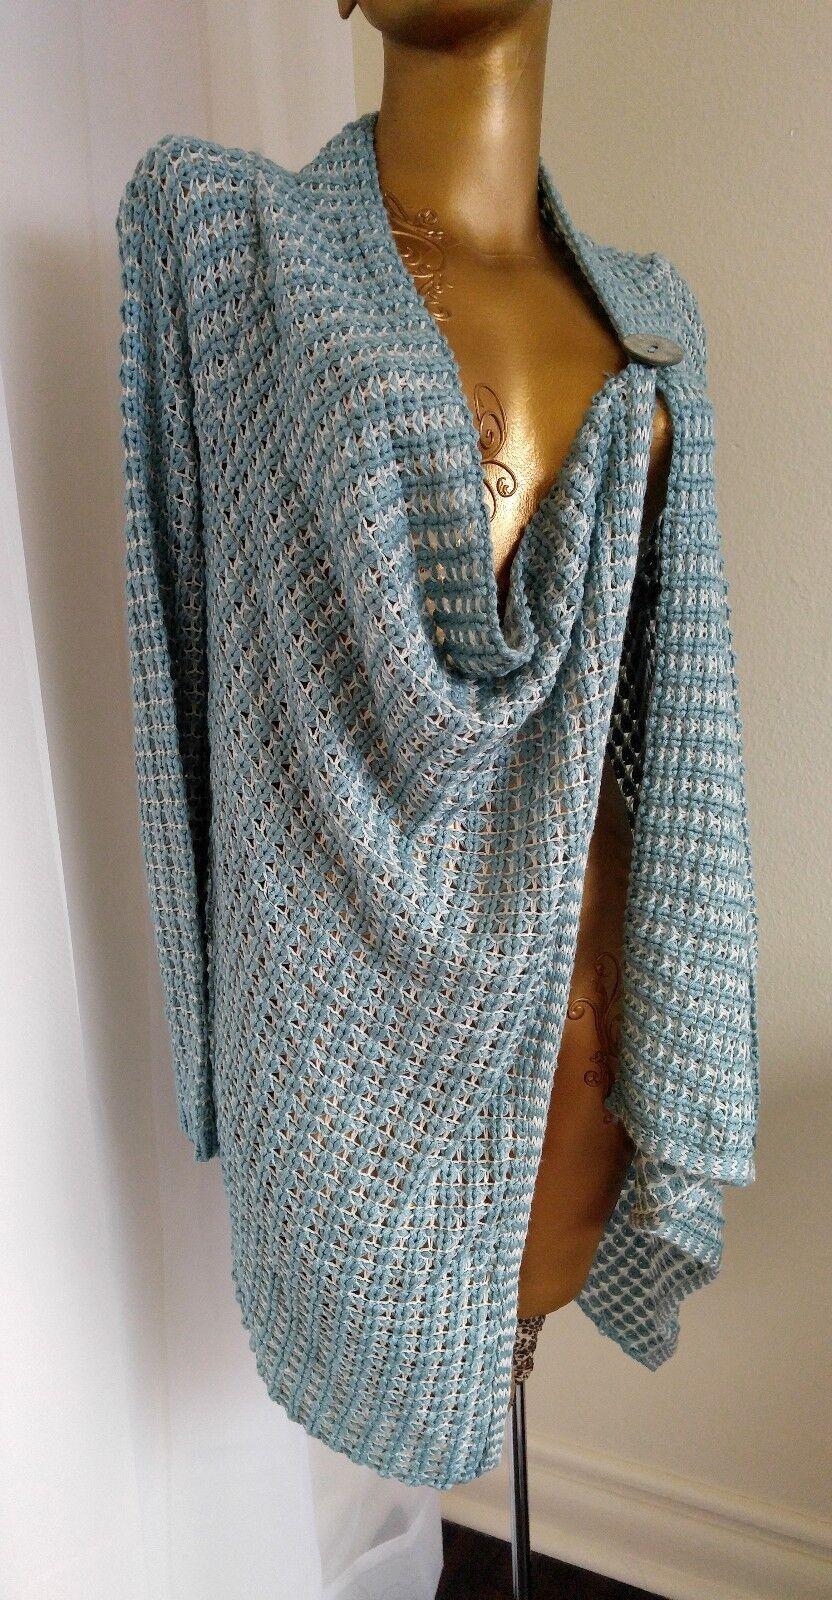 greenIGO Paris Turquoise Cardigan Asymmetrical Sweater Tunic Sz L XL